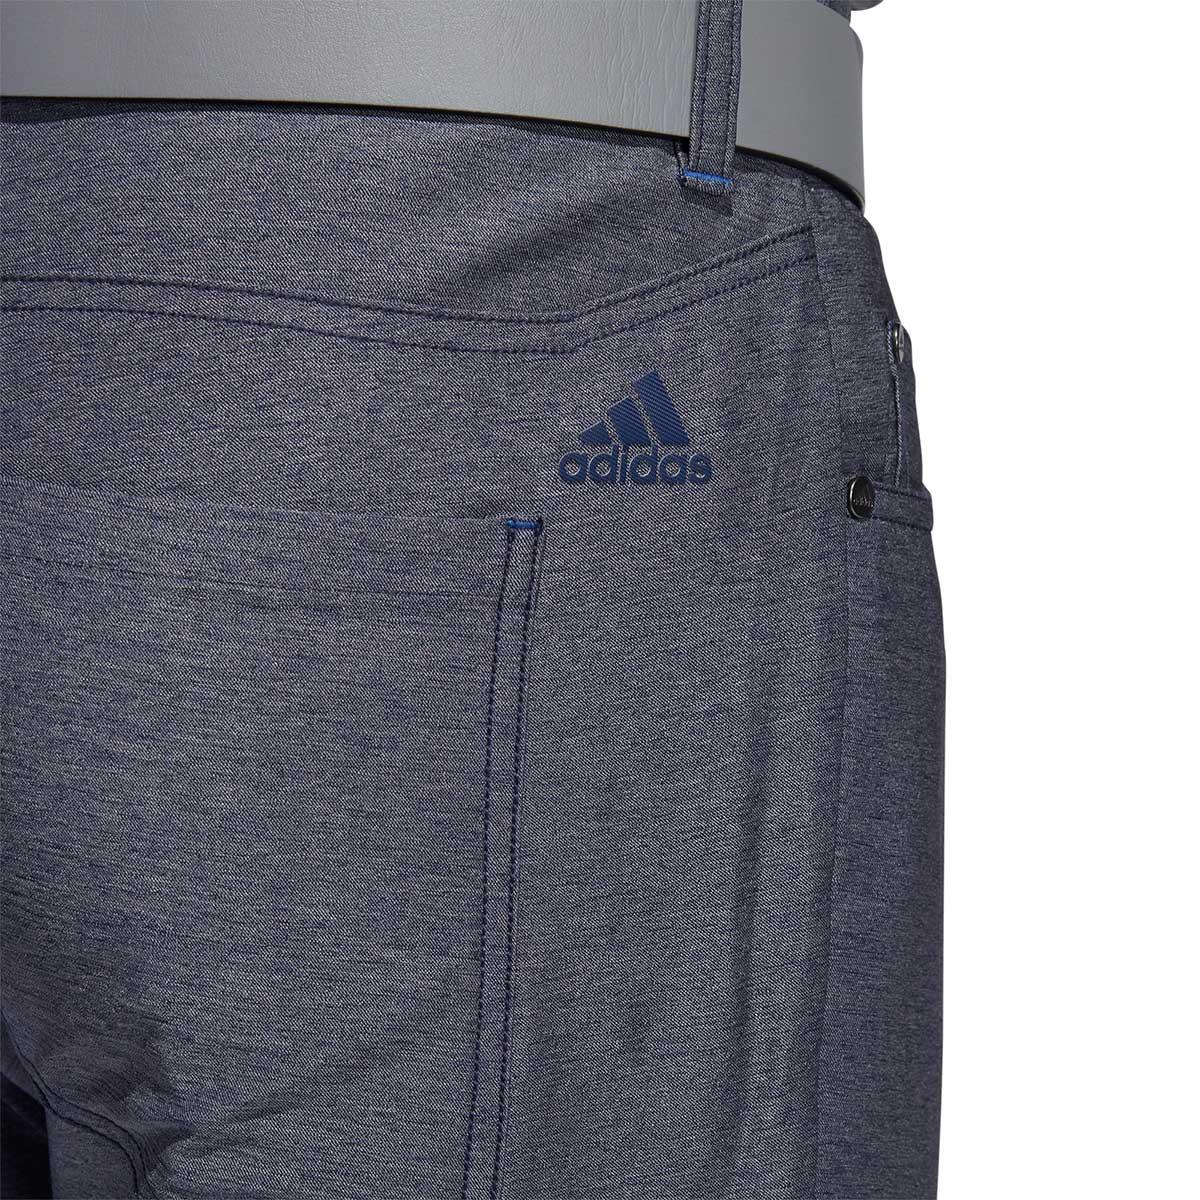 Adidas Ultimate365 Heathered Five-Pocket Collegiate Navy Pants